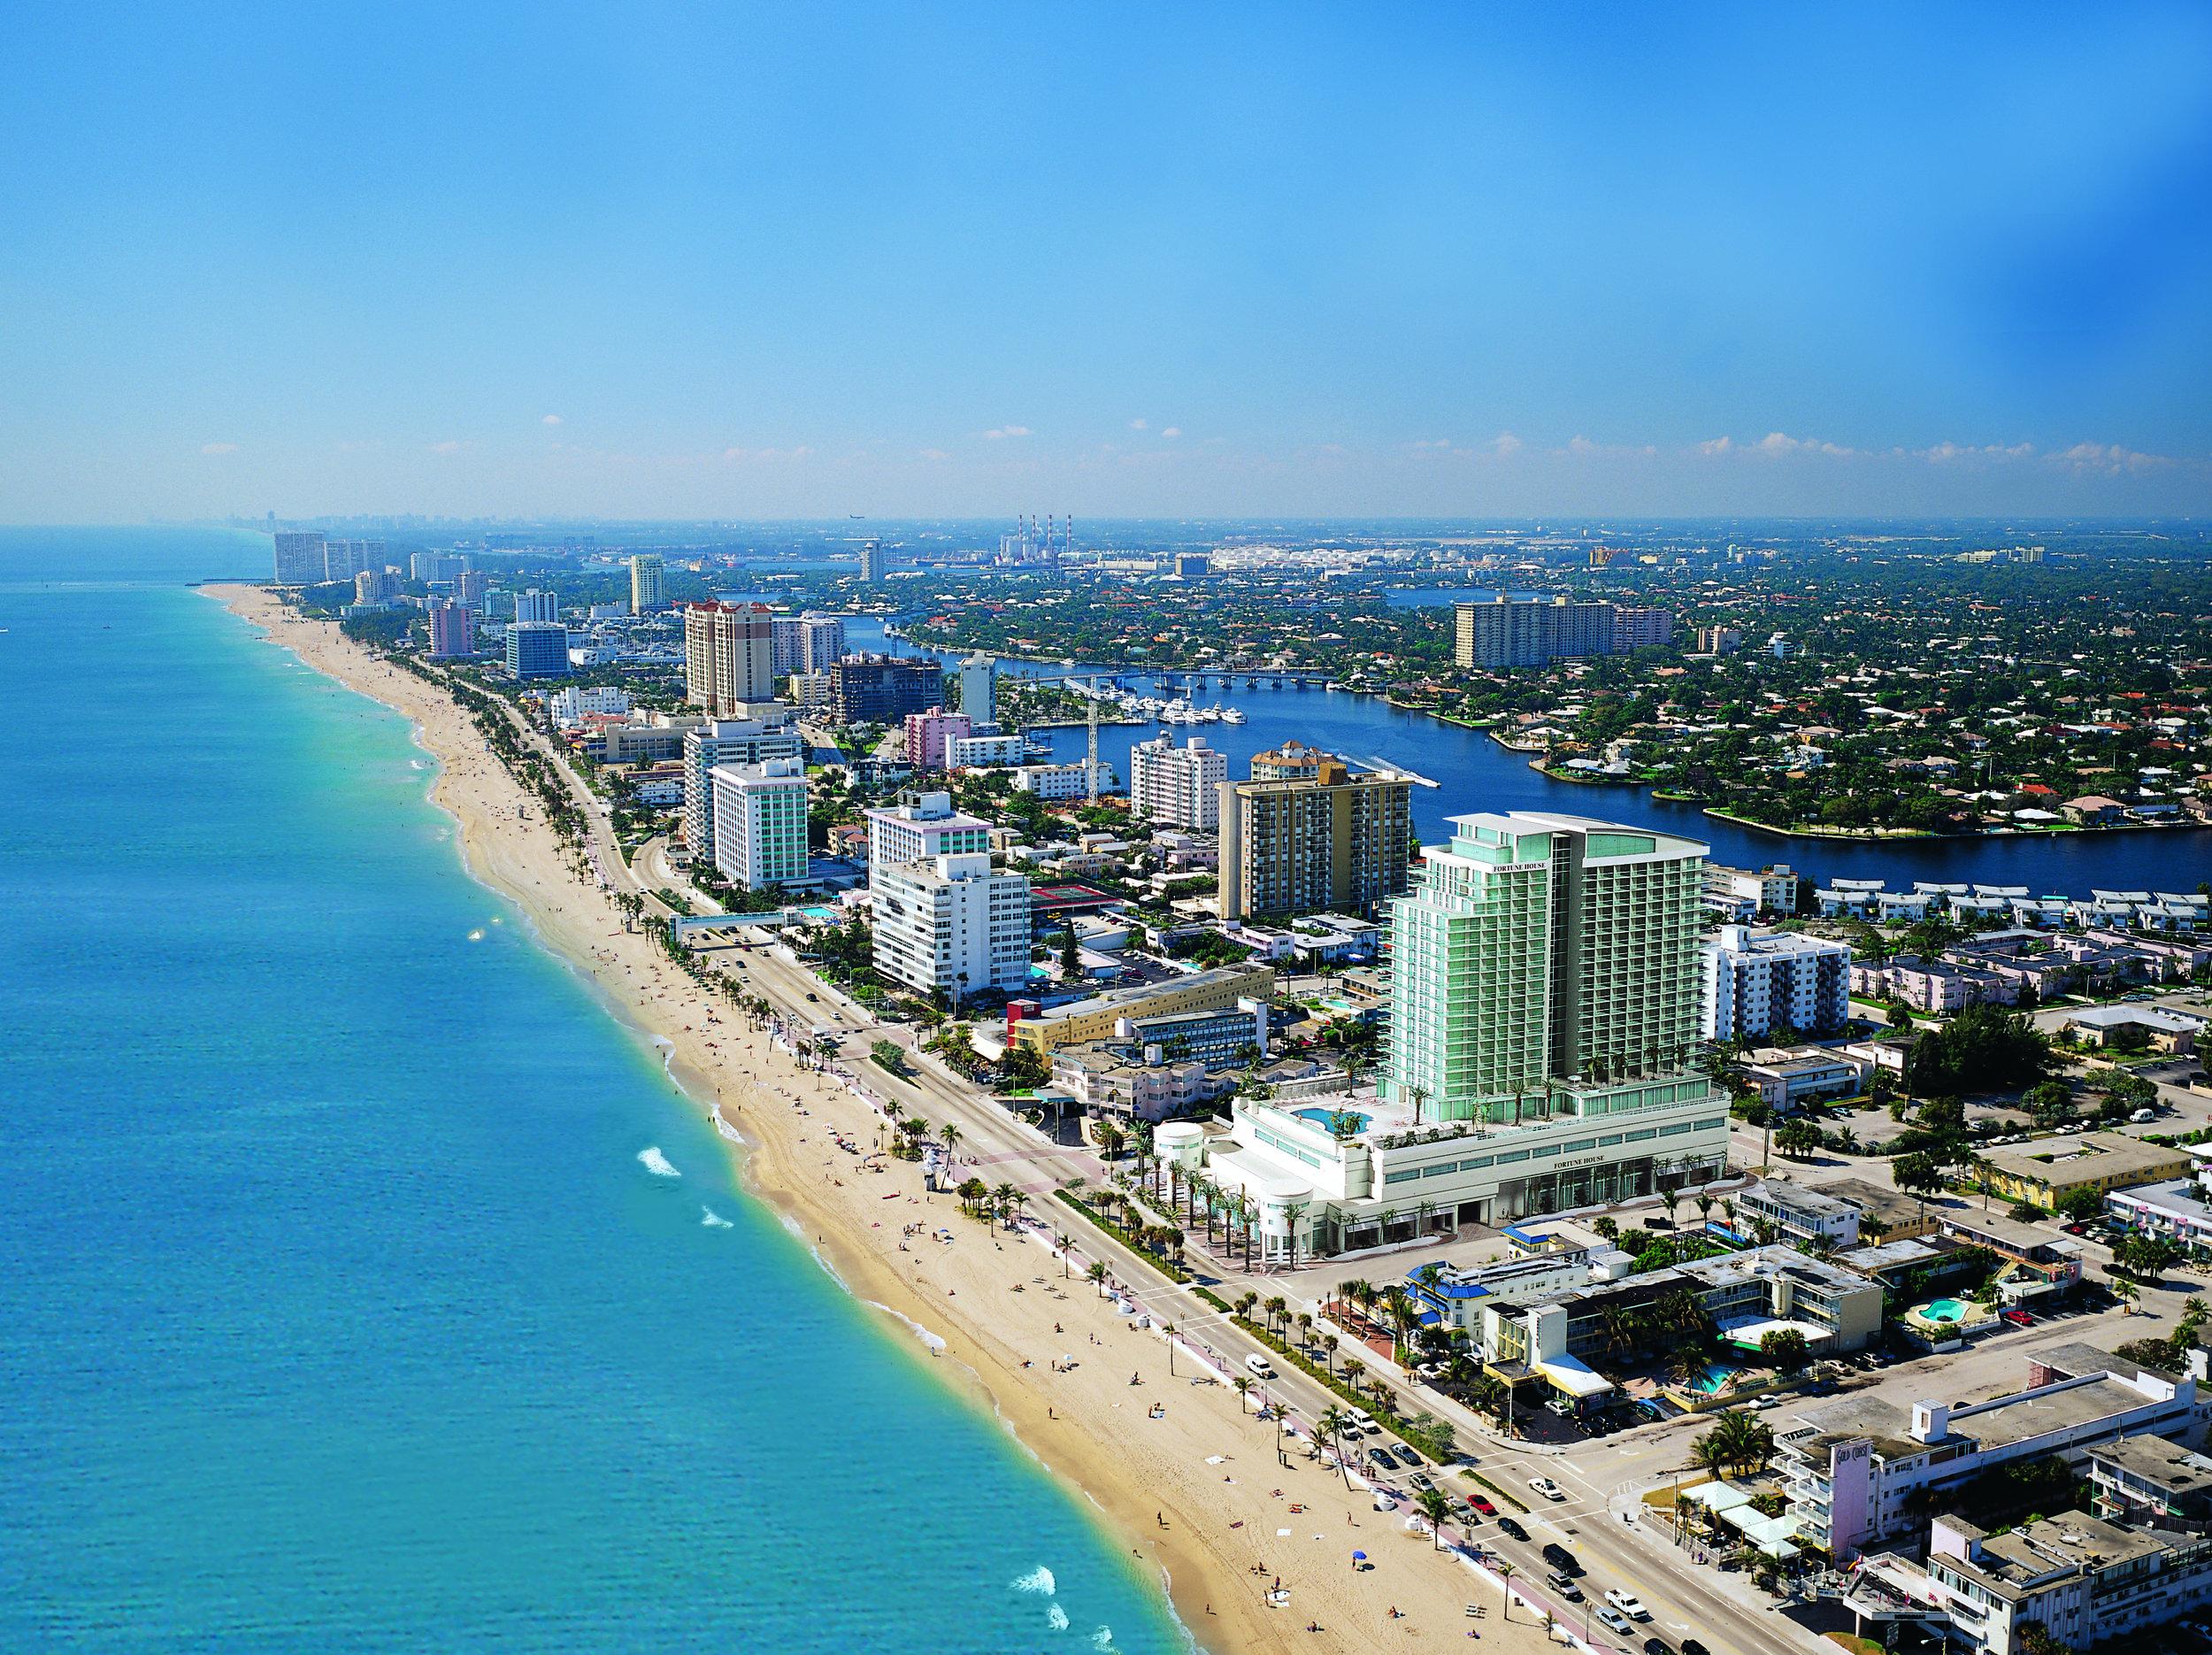 Fortune House | Fort Lauderdale, FL | Architect: Bermello Ajamil